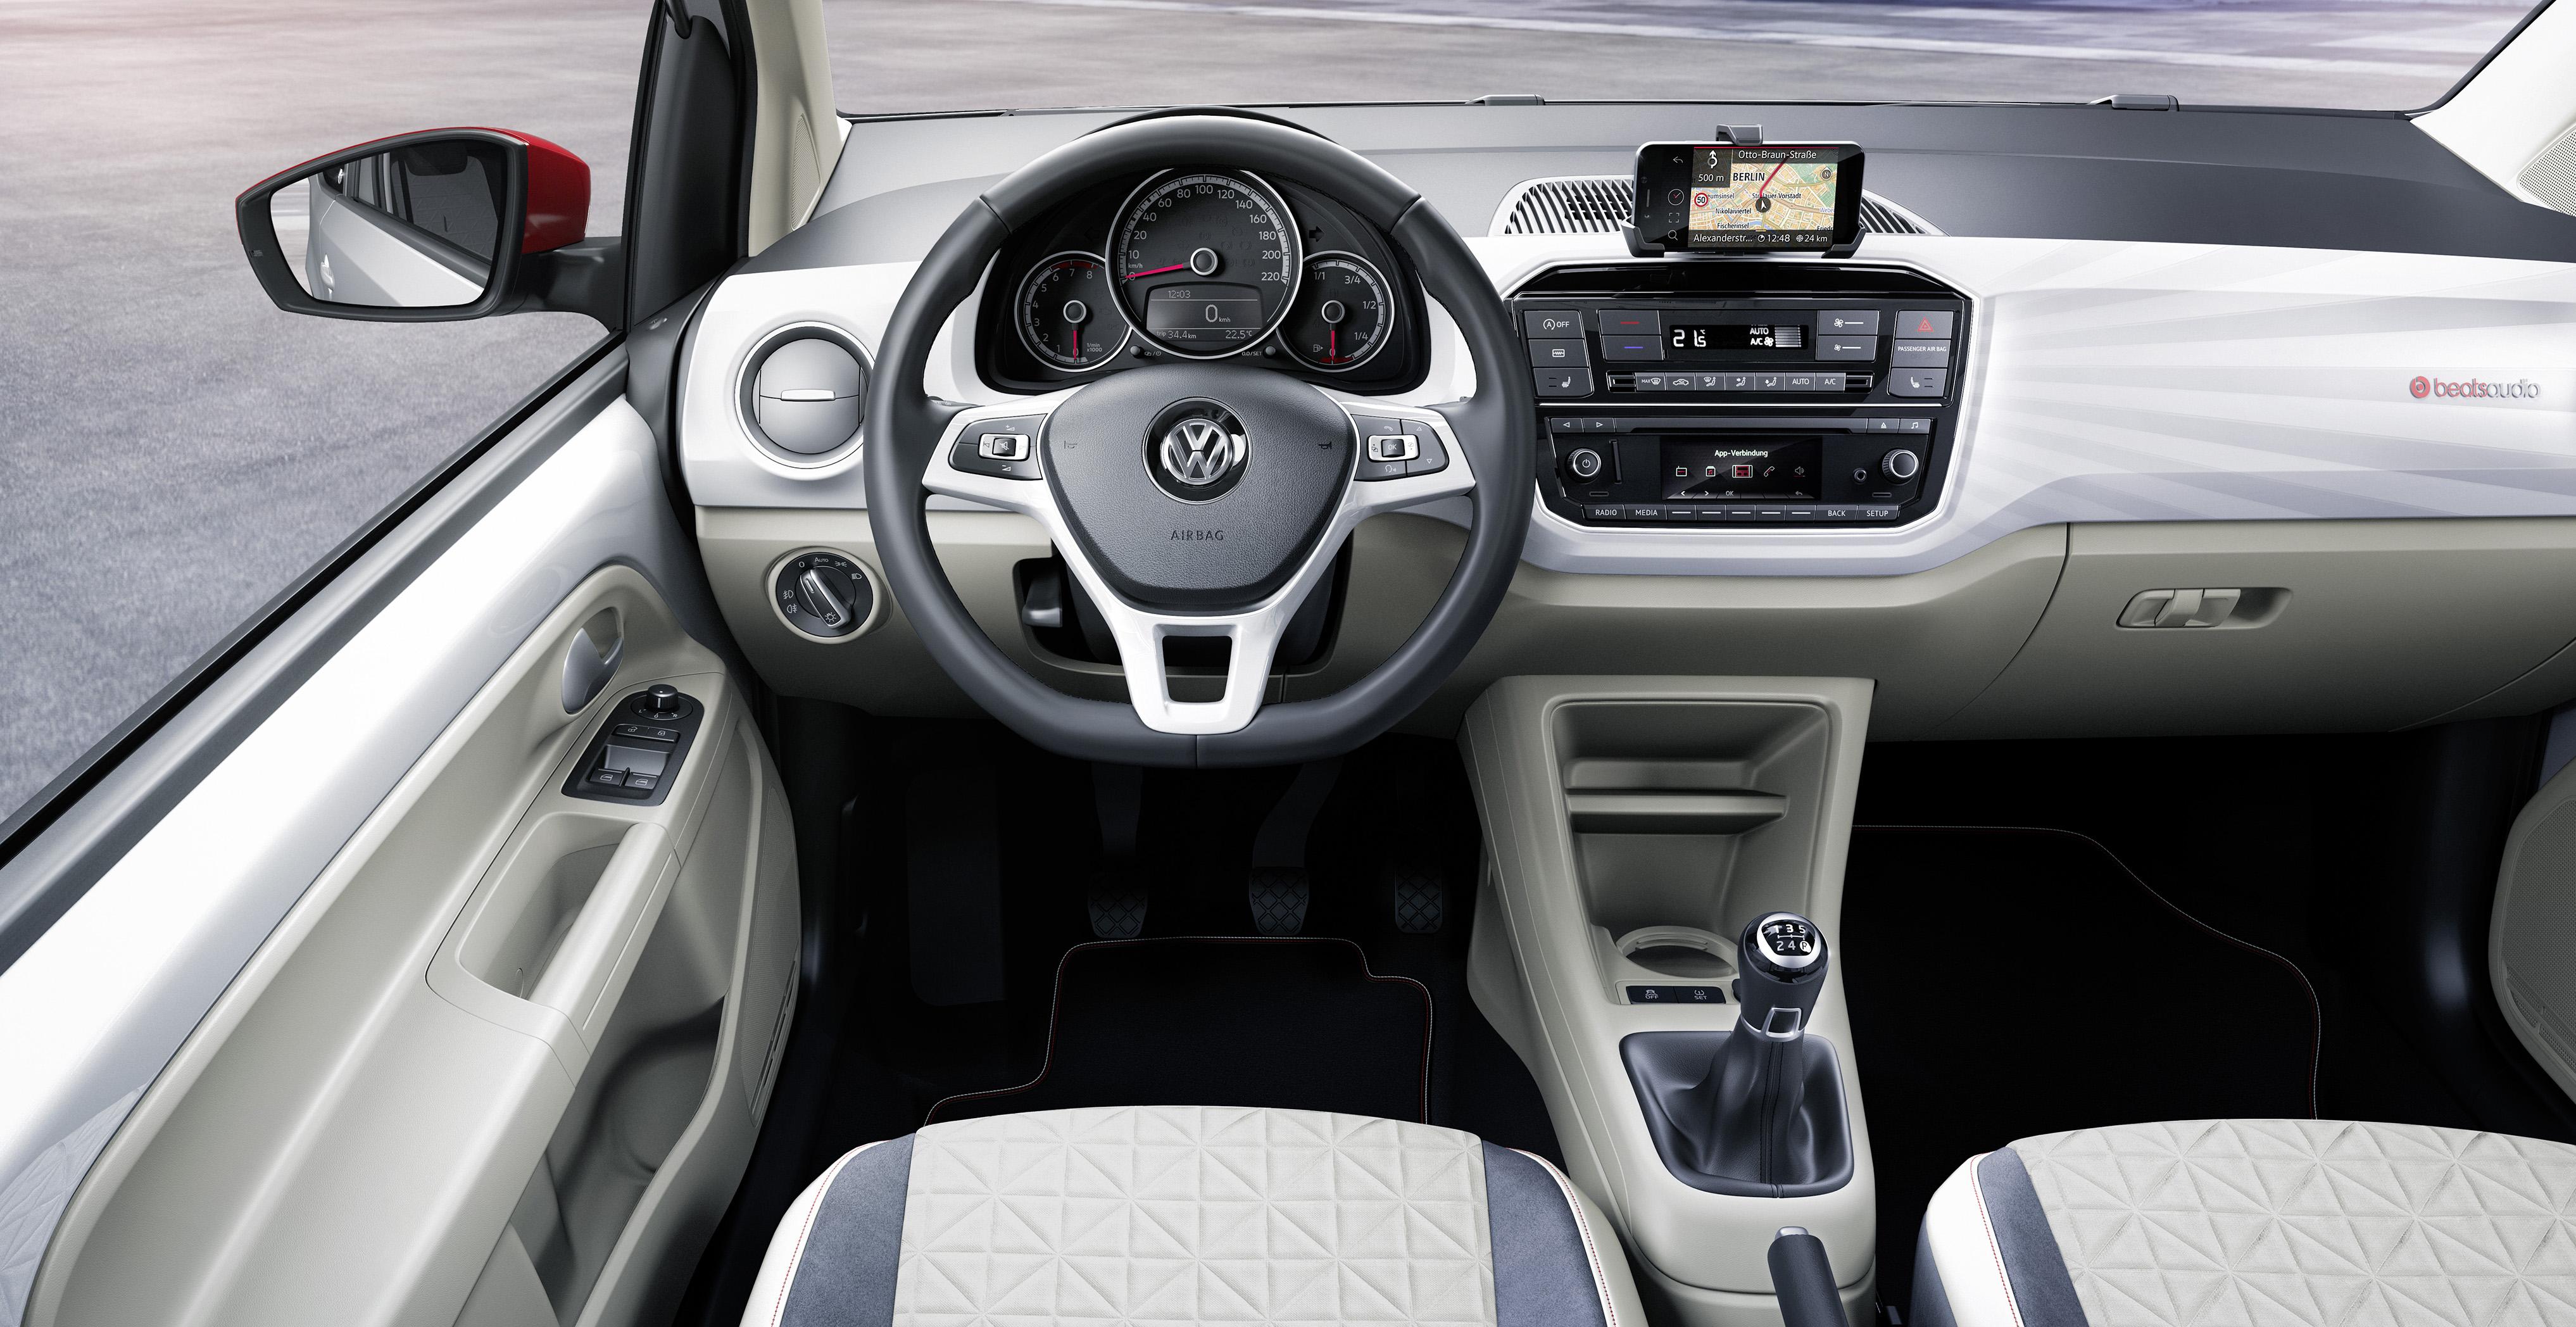 Volkswagen Golf Gti Pictures besides Wallpaper 0d moreover Volkswagen Golf Gti Clubsport In Pictures furthermore Konig Wheels Tweakd Silver Machined moreover 20 Zoll Rotor 2 I207950182. on volkswagen gti